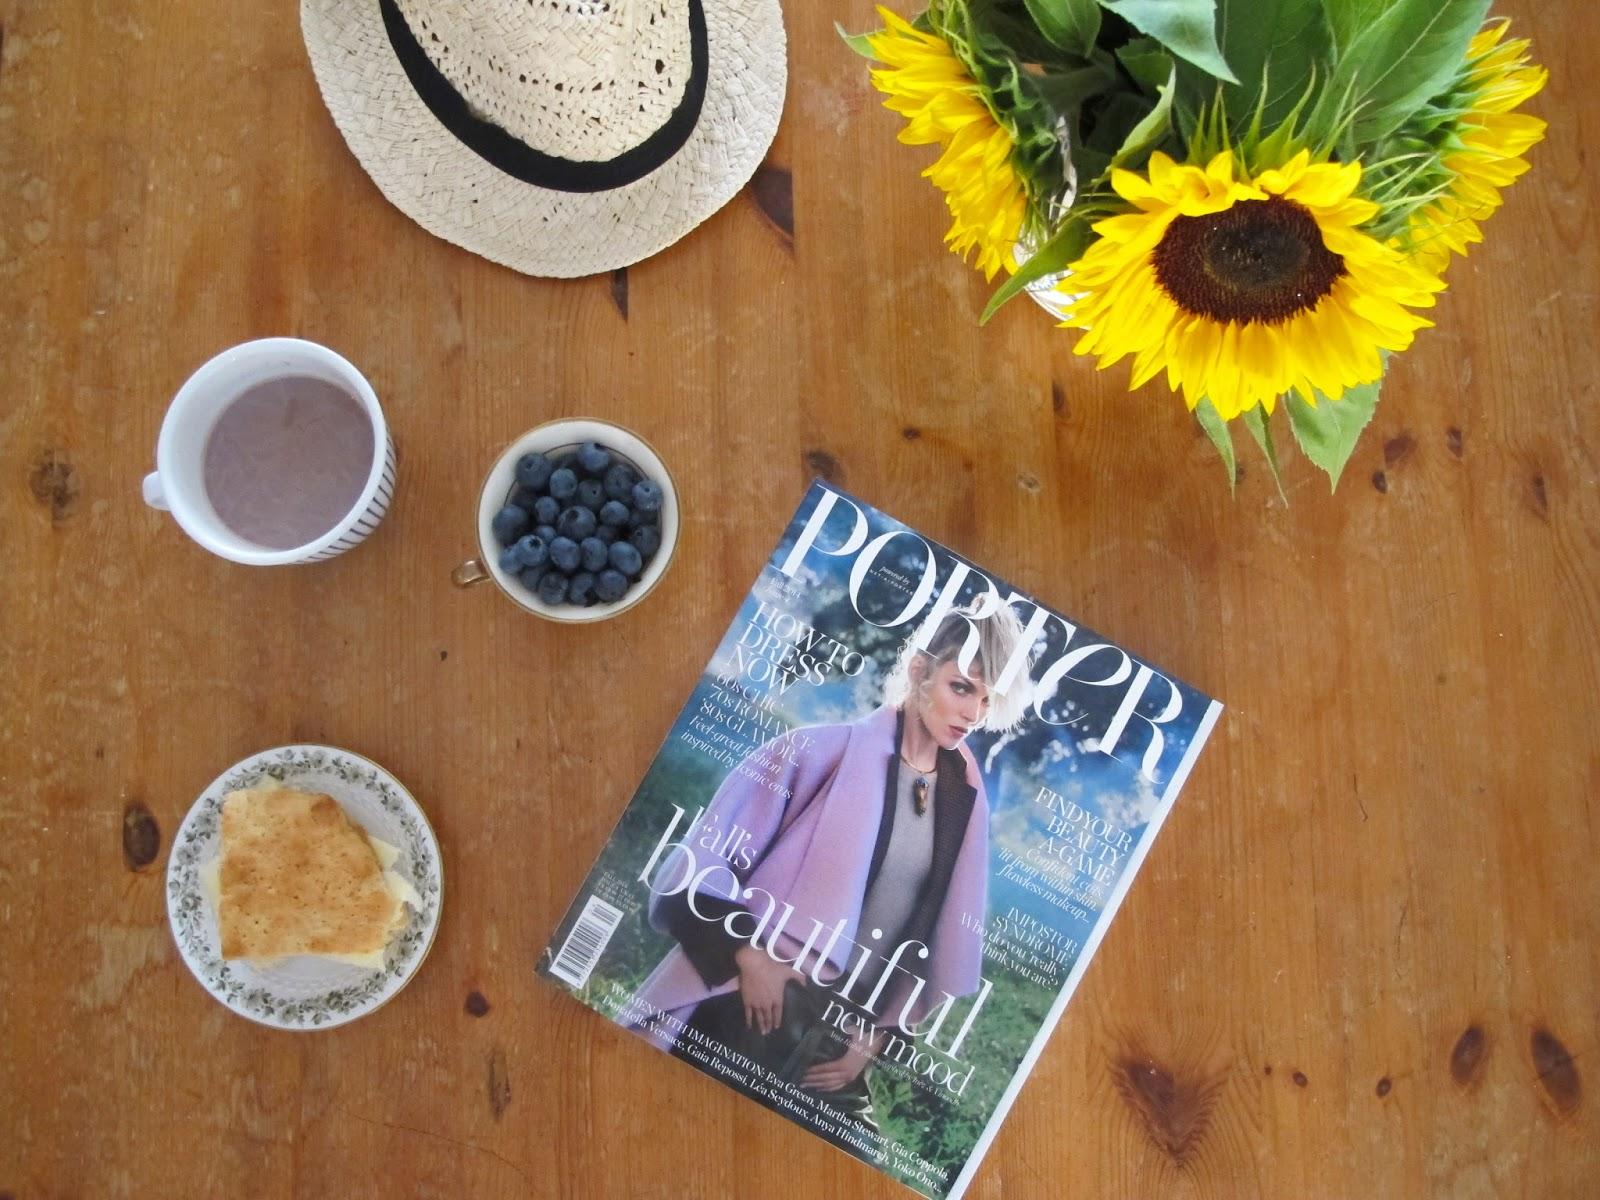 Porter Magazine, Net-a-porter, Scones, Hot Cocoa, Sunday